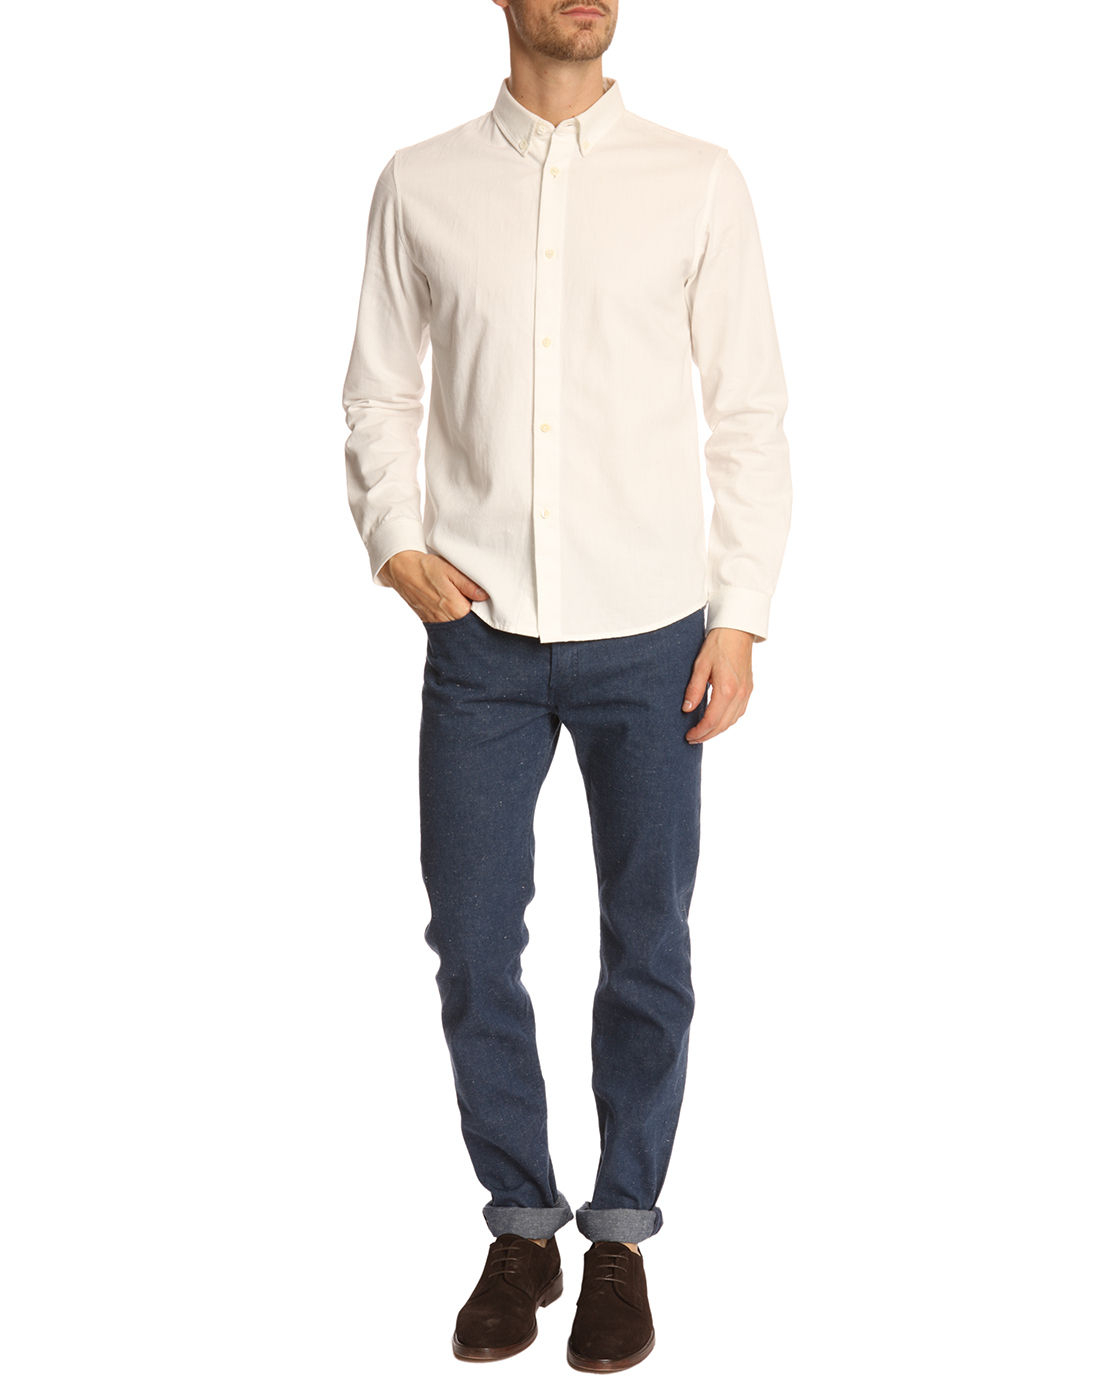 Off White Button Down Shirt   Is Shirt